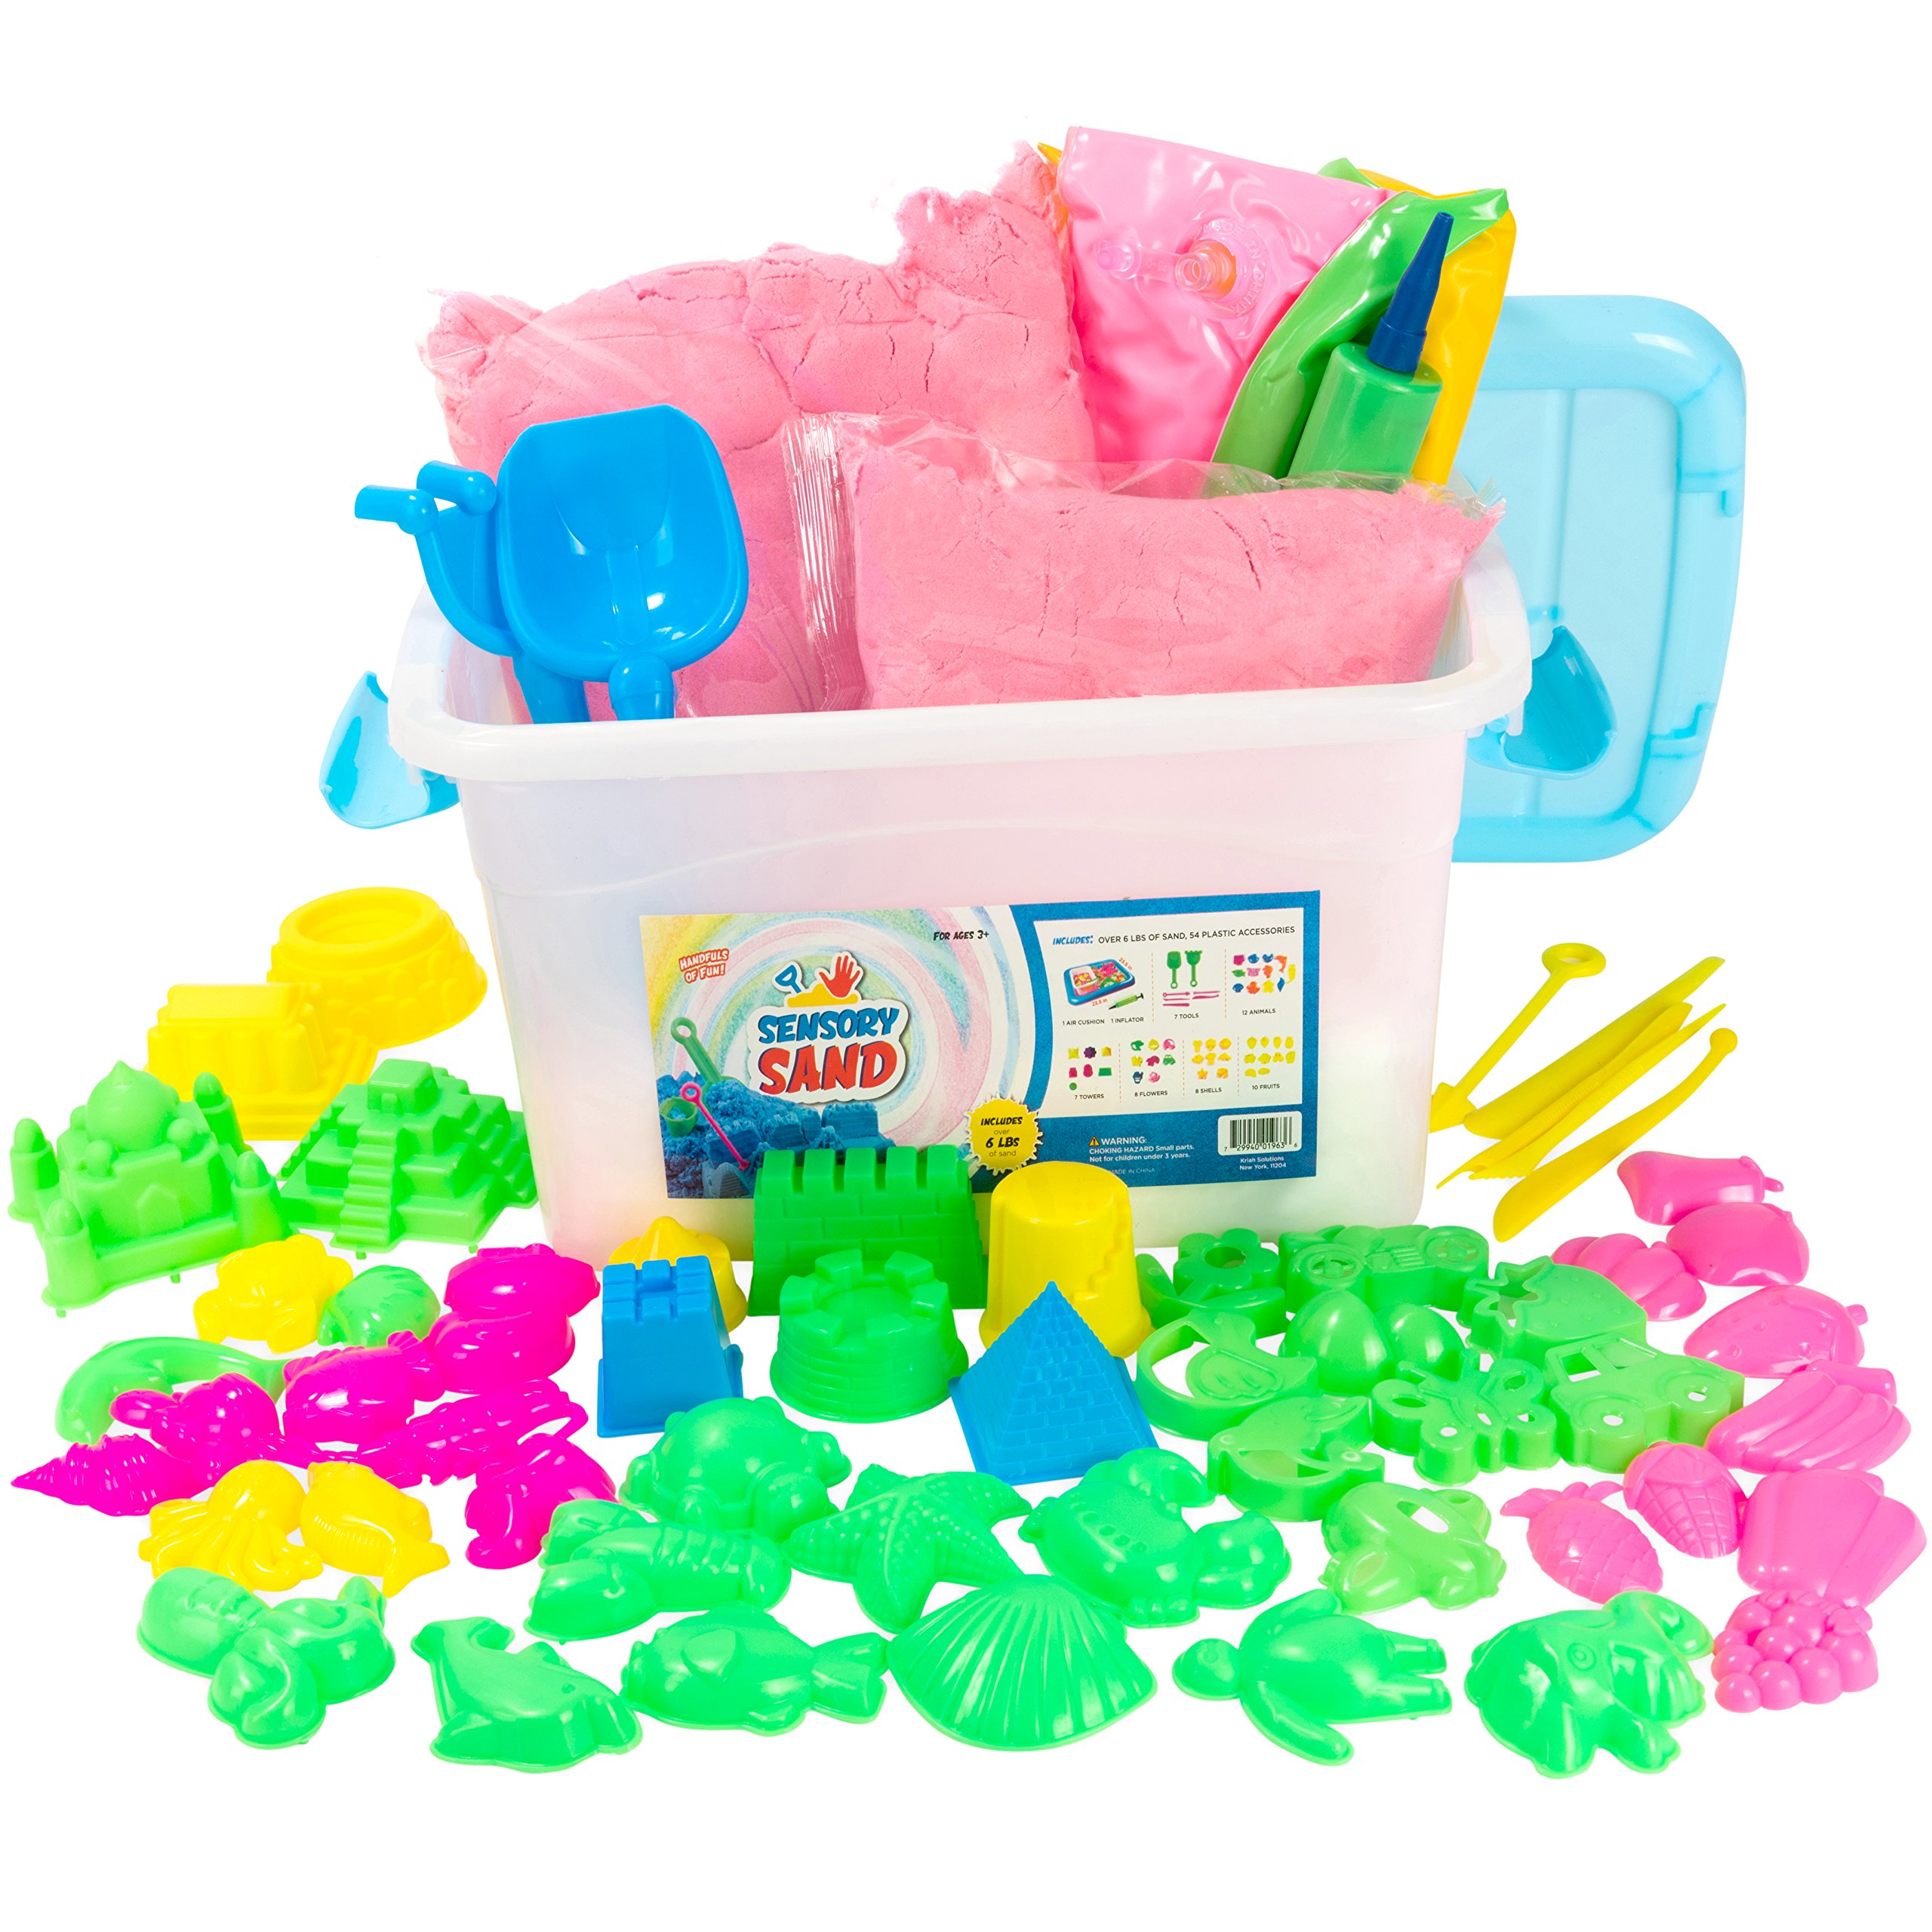 Sensory Sand Kit (Pink, 6 Pound)